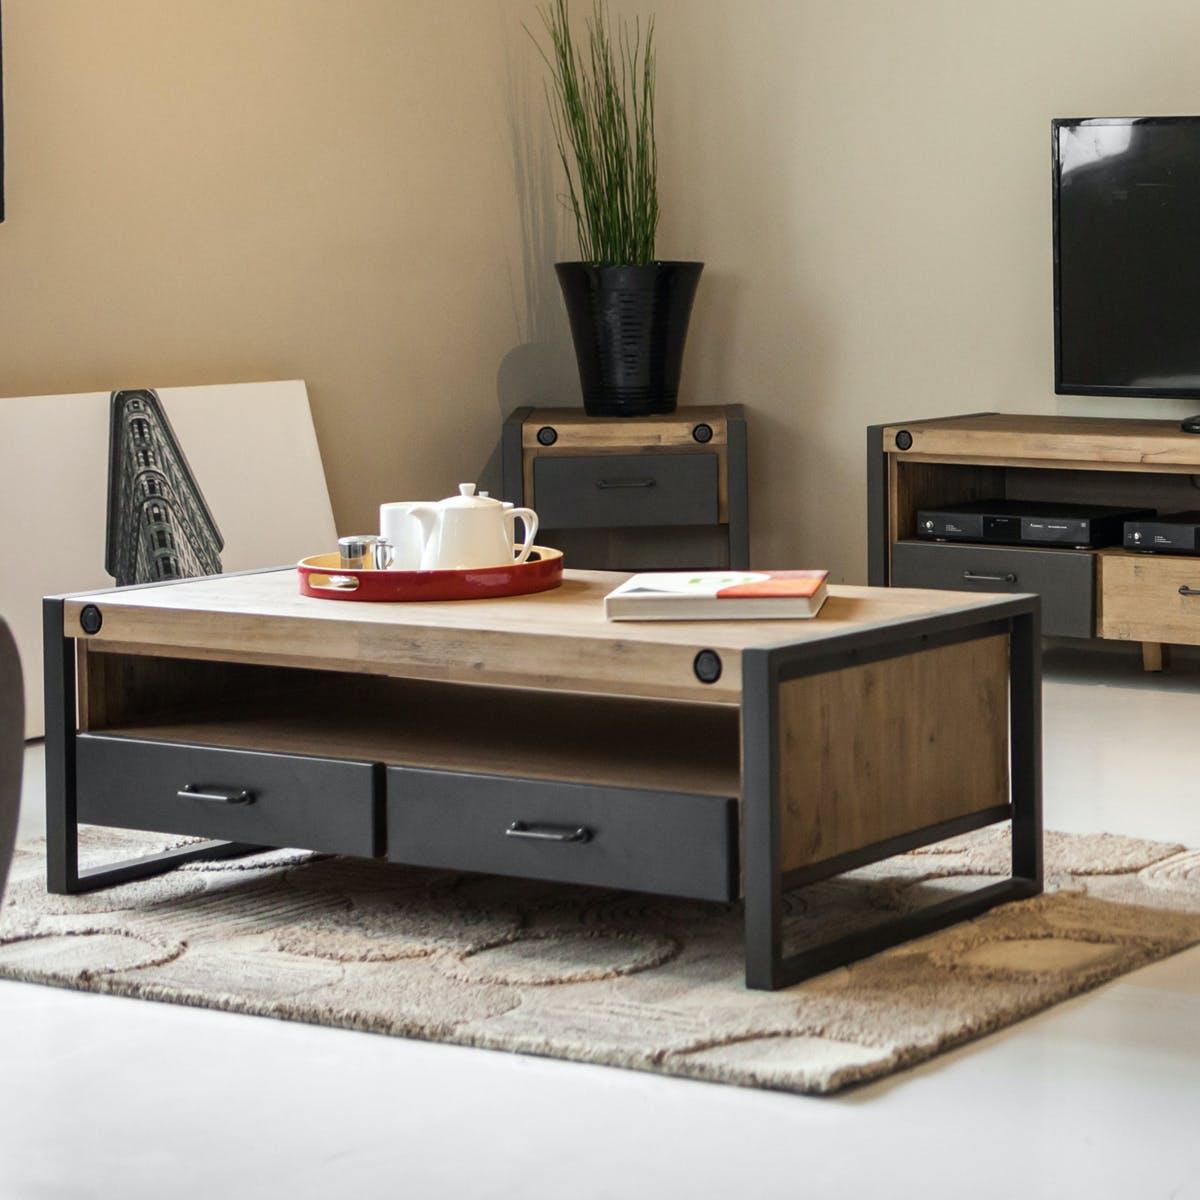 Agreable Table Basse Industrielle Bois Métal Boulons BROOKLYN